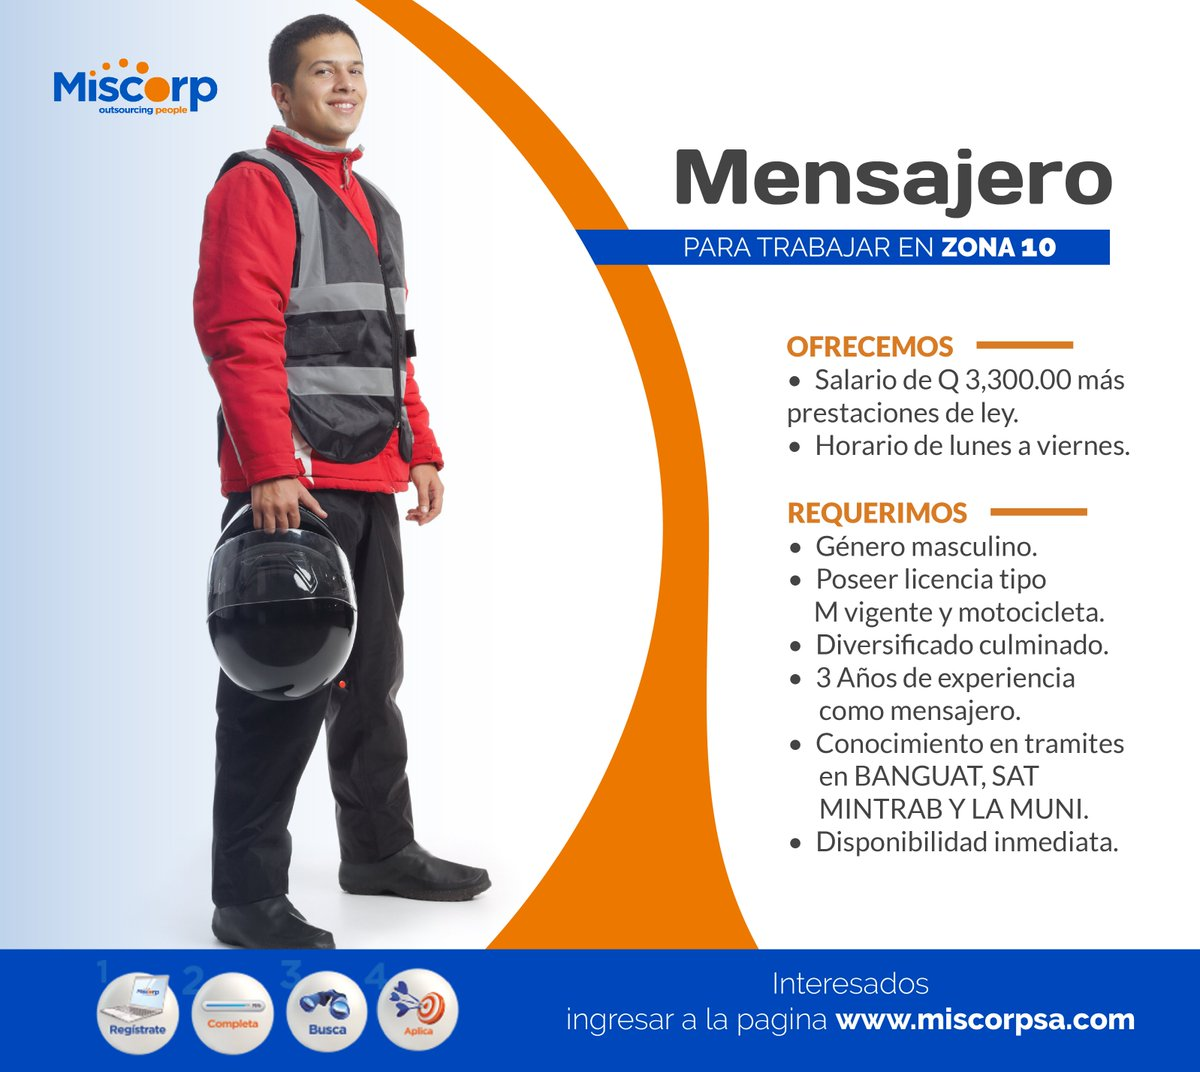 Miscorp Agenciamiscorp Twitter